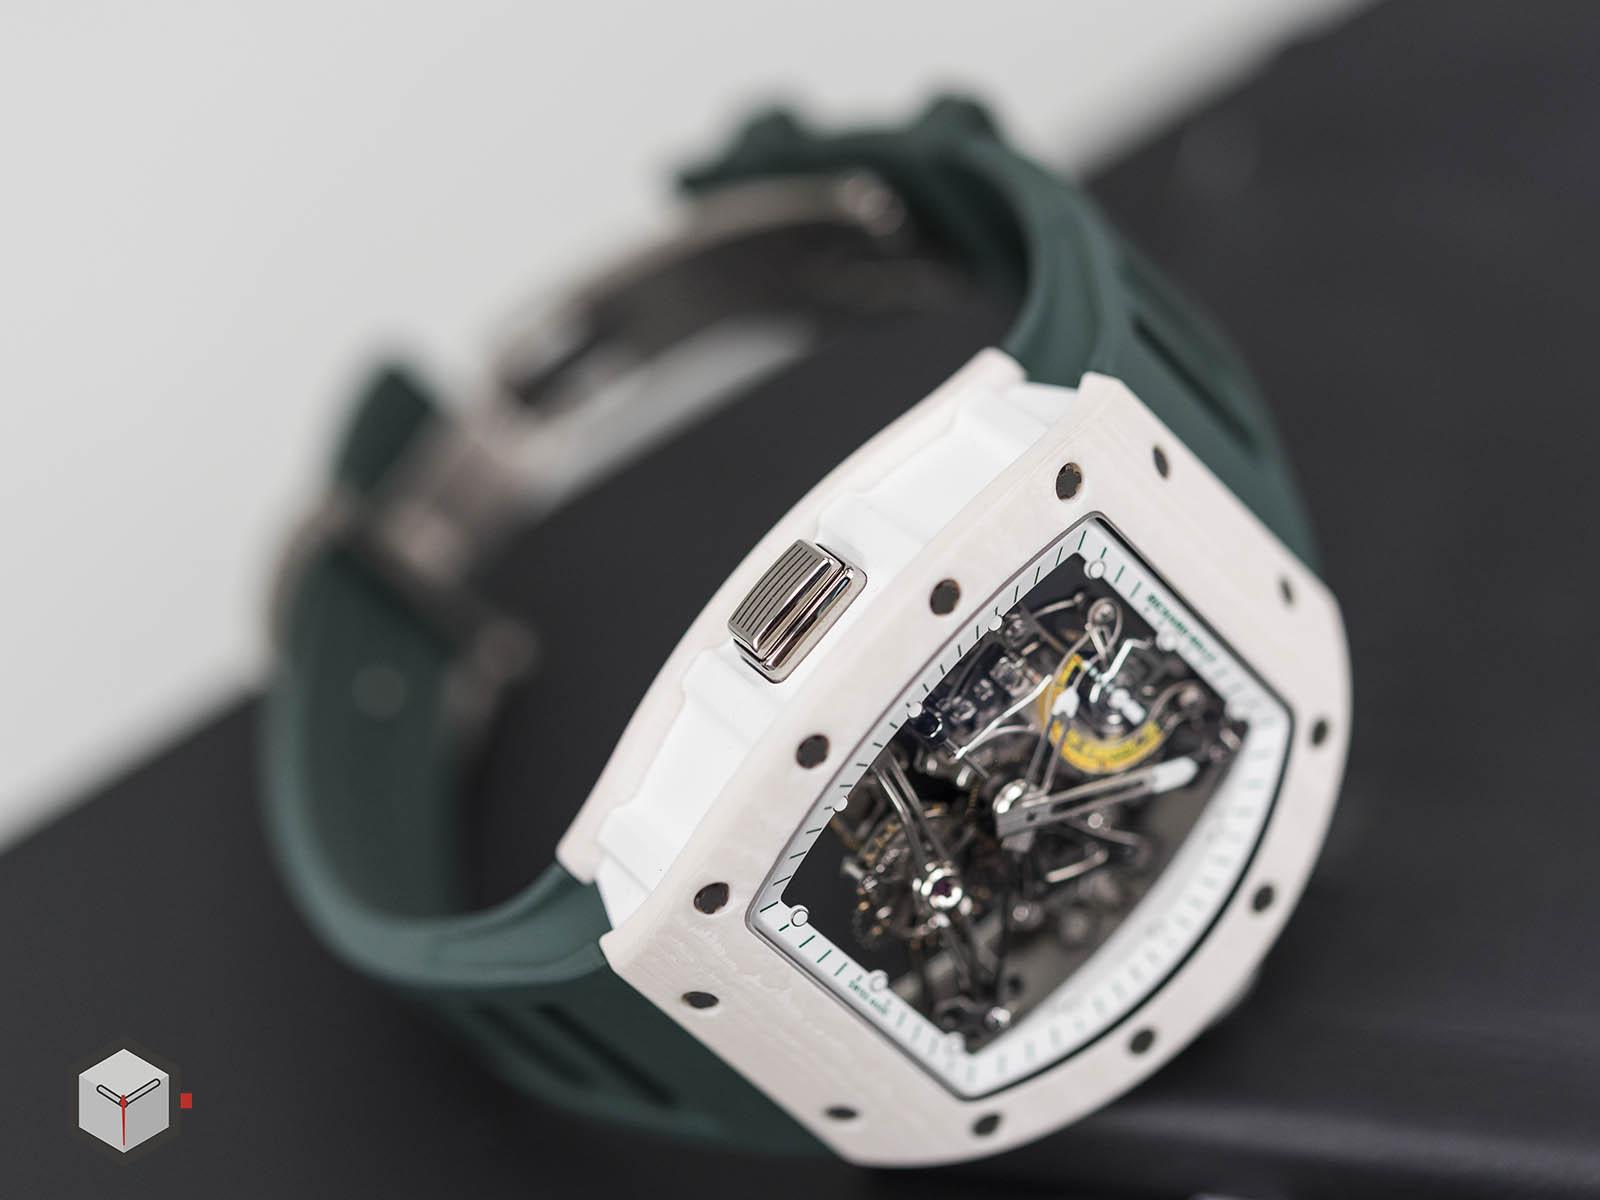 rm38-01-richard-mille-tourbillon-g-sensor-bubba-watson-4.jpg